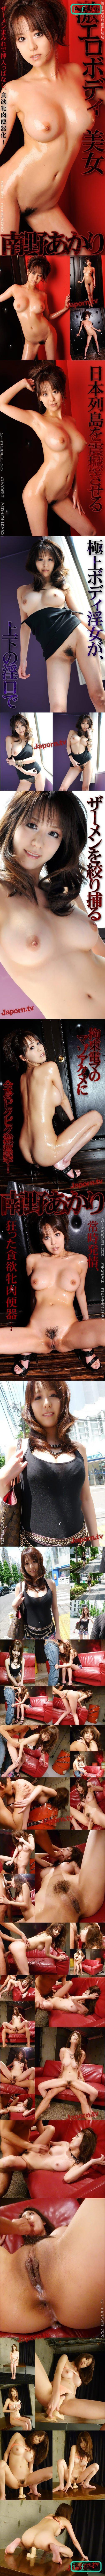 [SMD 33] S Model 33 : Akari Minamino 南野あかり SMD Akari Minamino